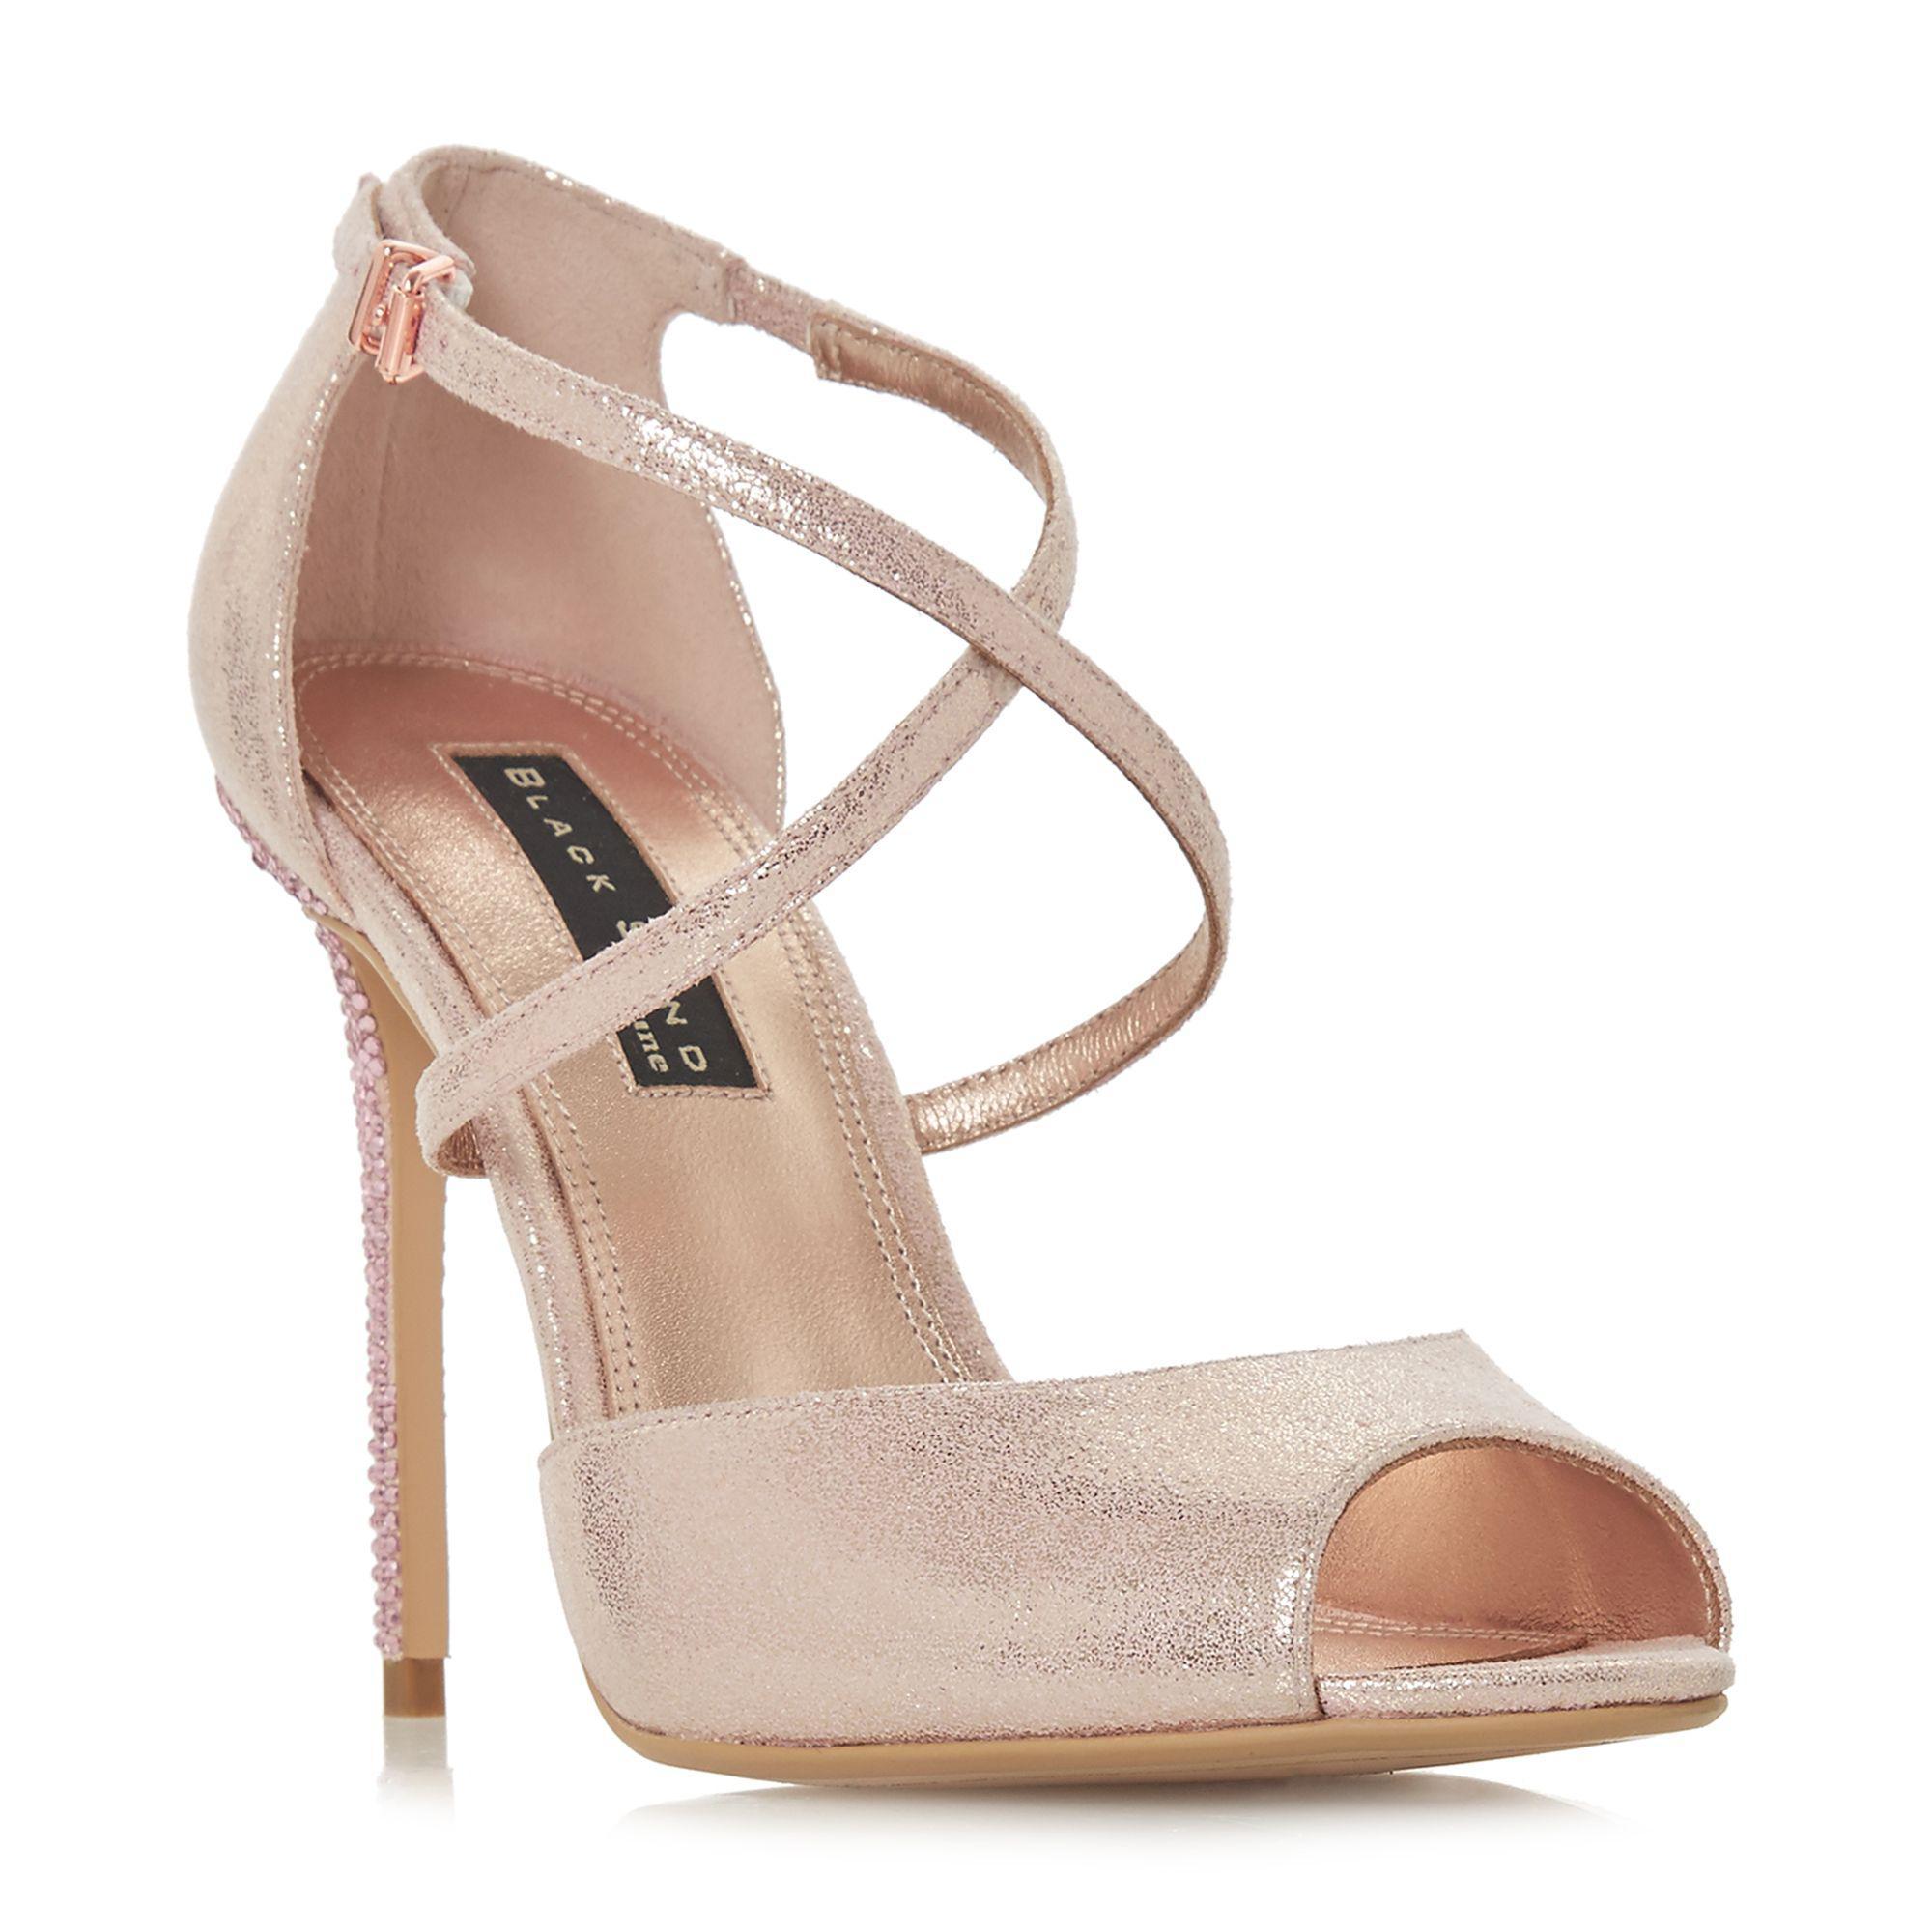 0d7752b9fde Dune. Women s Light Pink  marilynee  High Stiletto Heel Ankle Strap Sandals